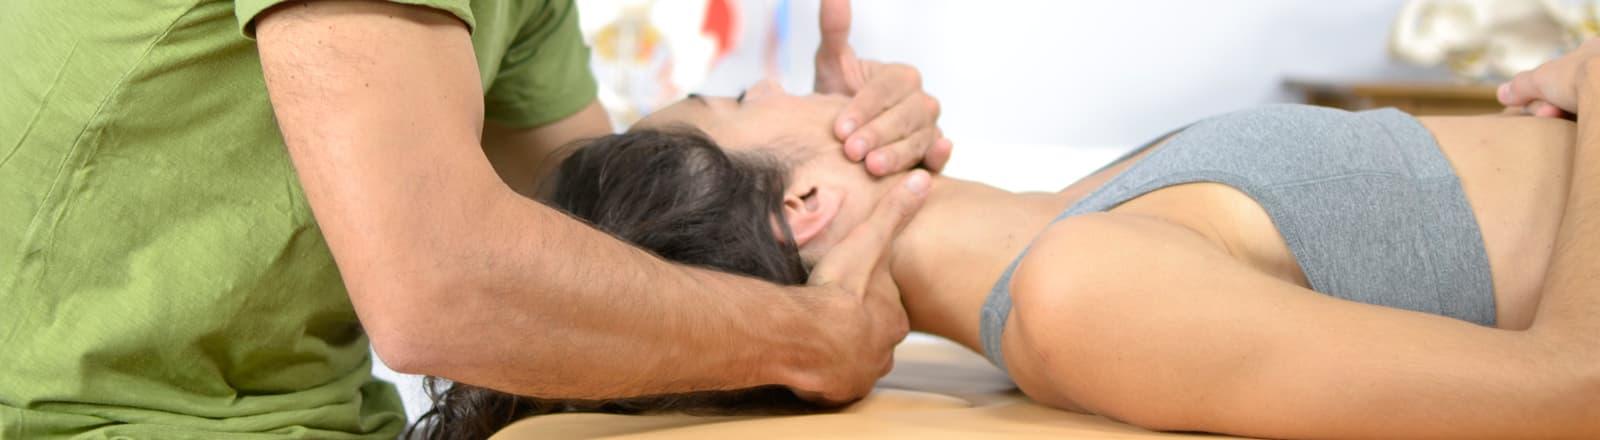 masaje terapéutico Logroño